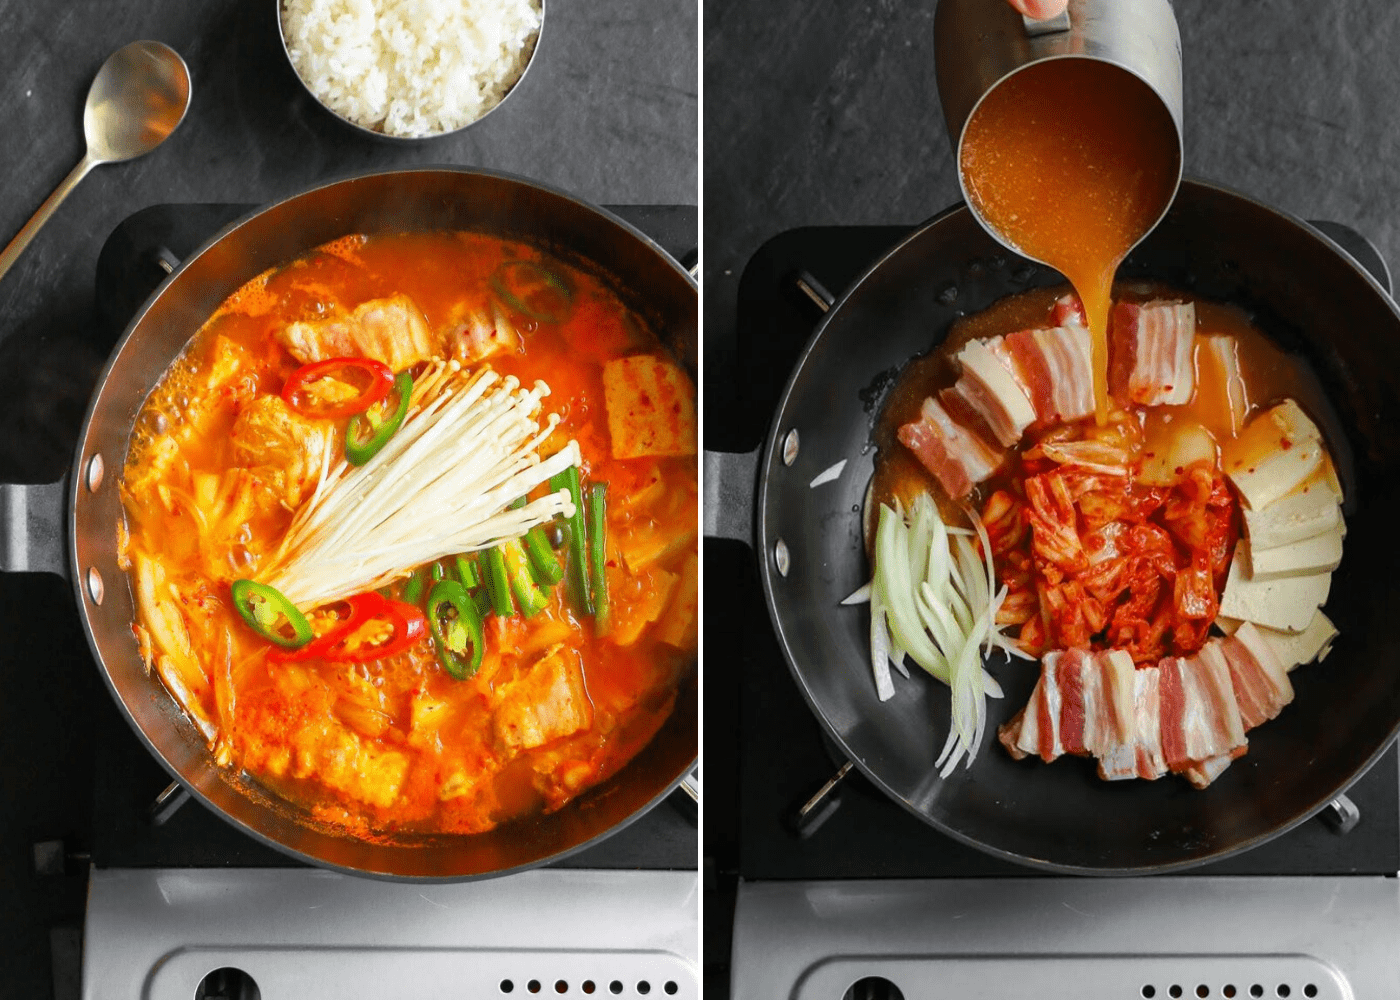 DIY meal kits: Ajumma's